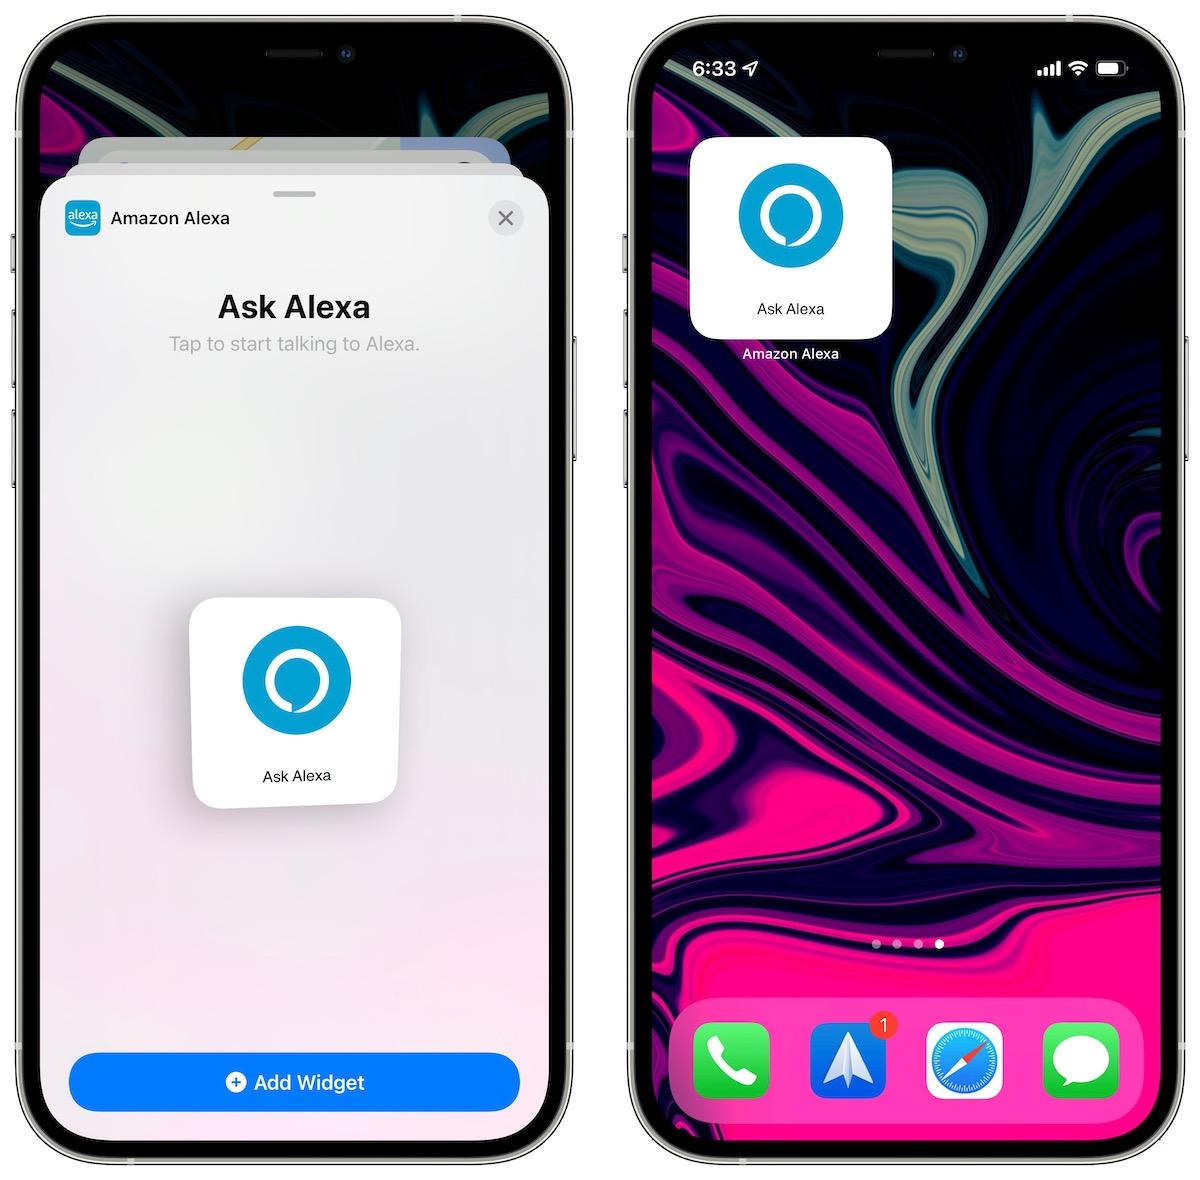 Amazon Alexa iOS Widget